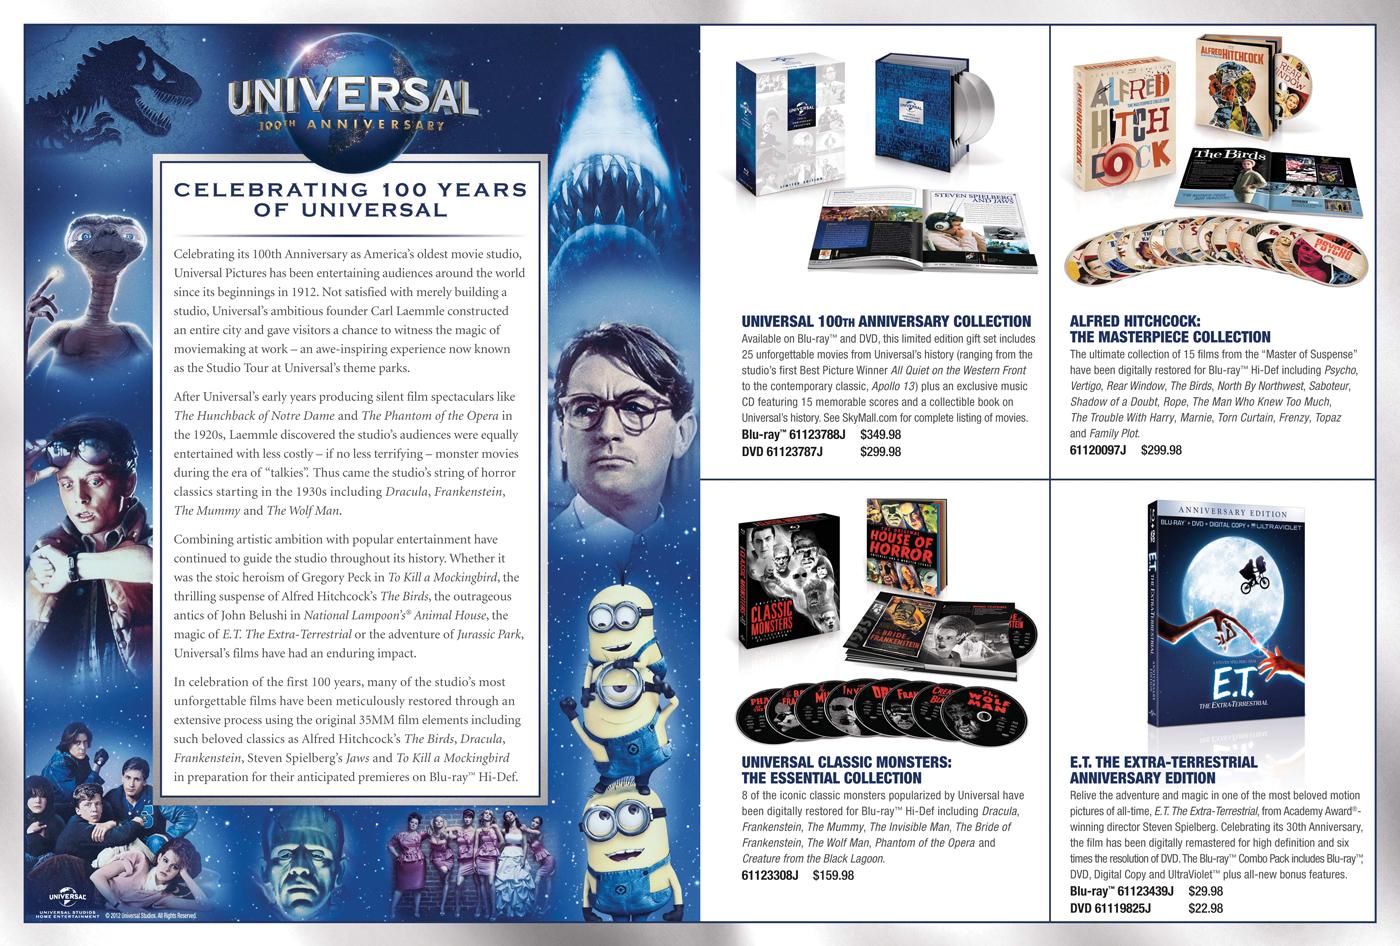 Universal100thAnniversary_Campaign_02.jpg